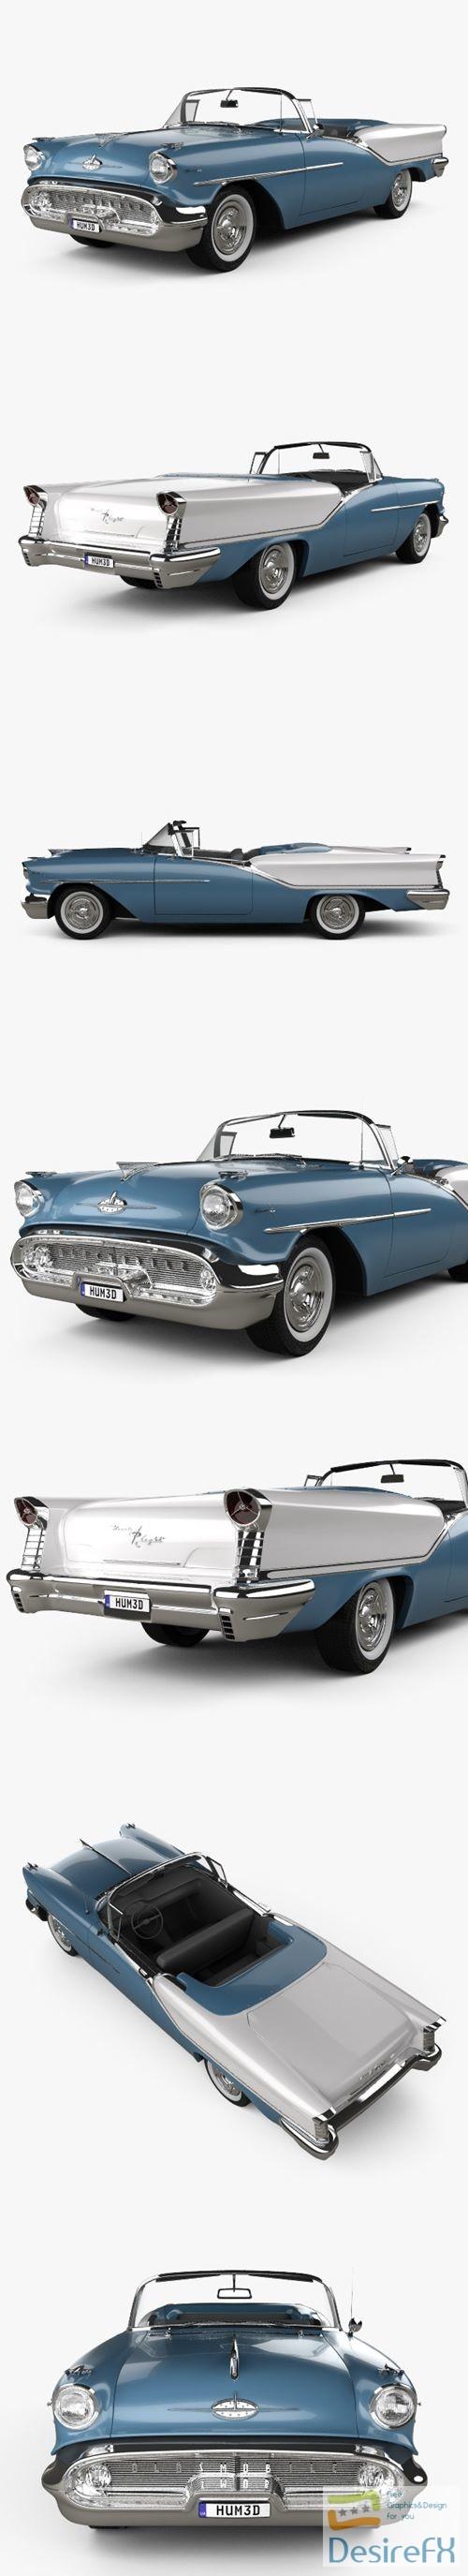 Oldsmobile Starfire 98 Convertible 1957 3D Model